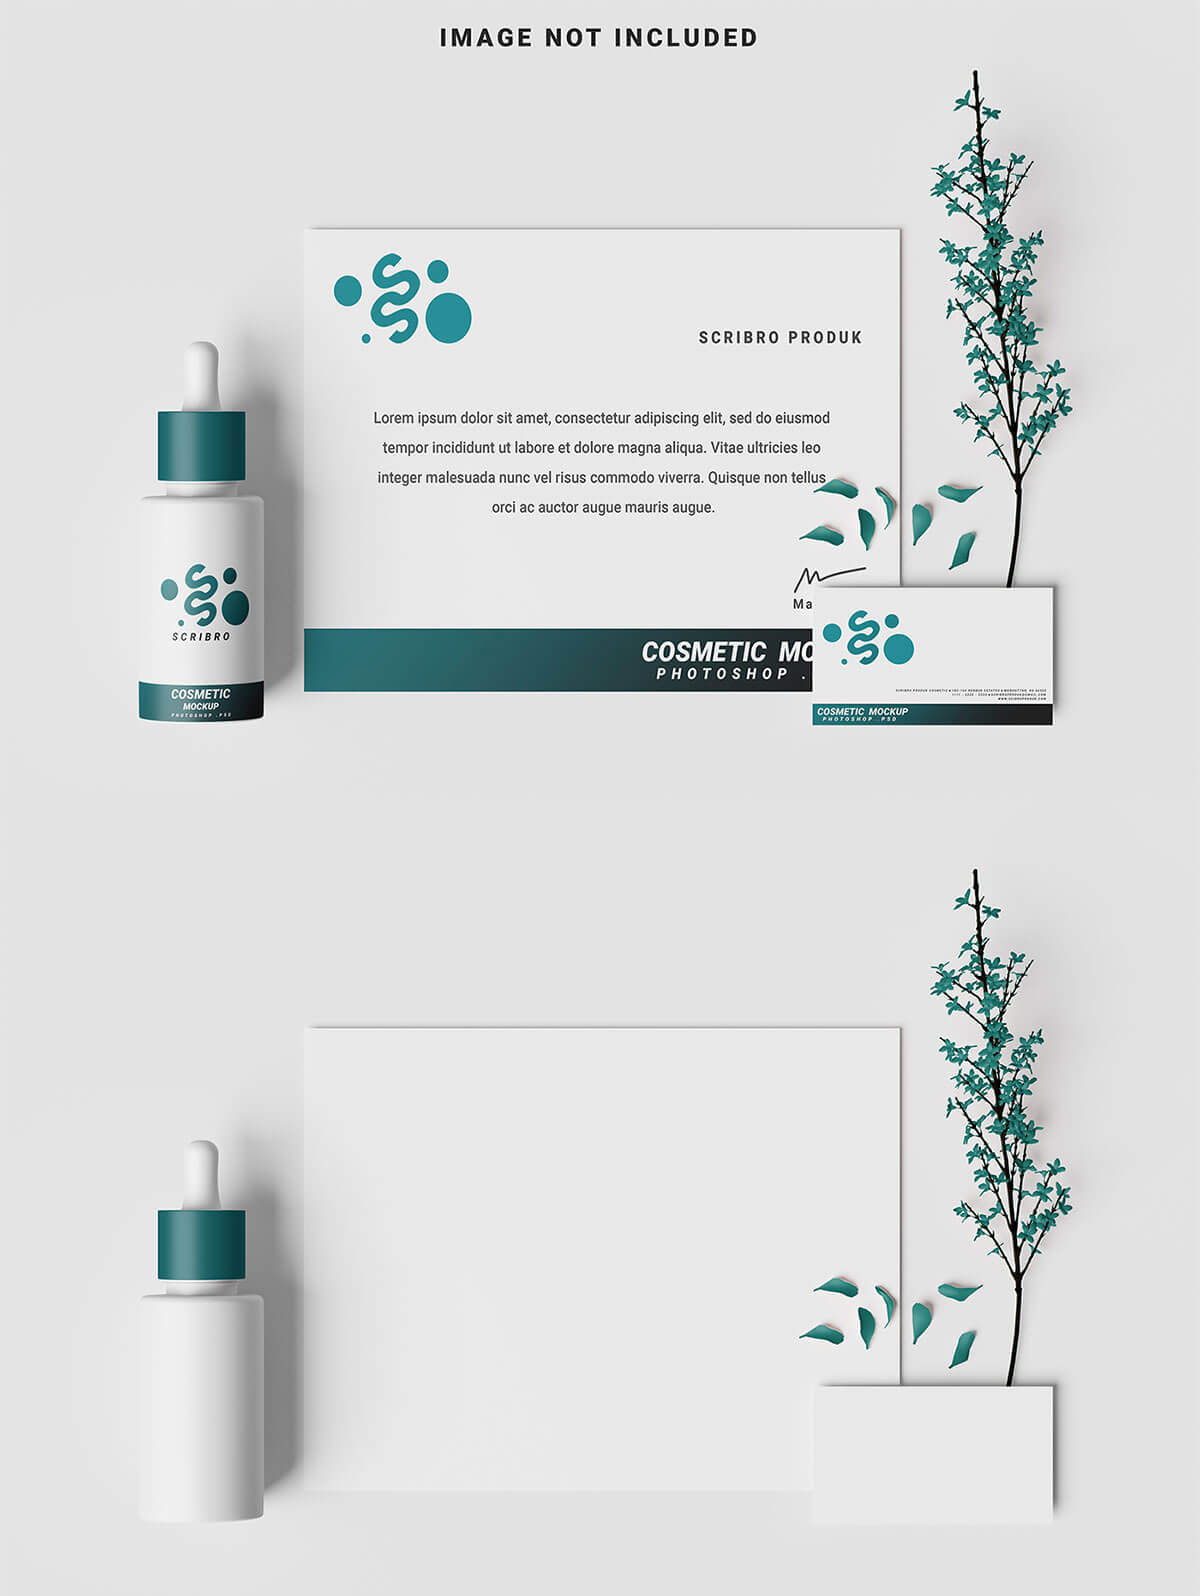 Free Cosmetic Branding Mockup